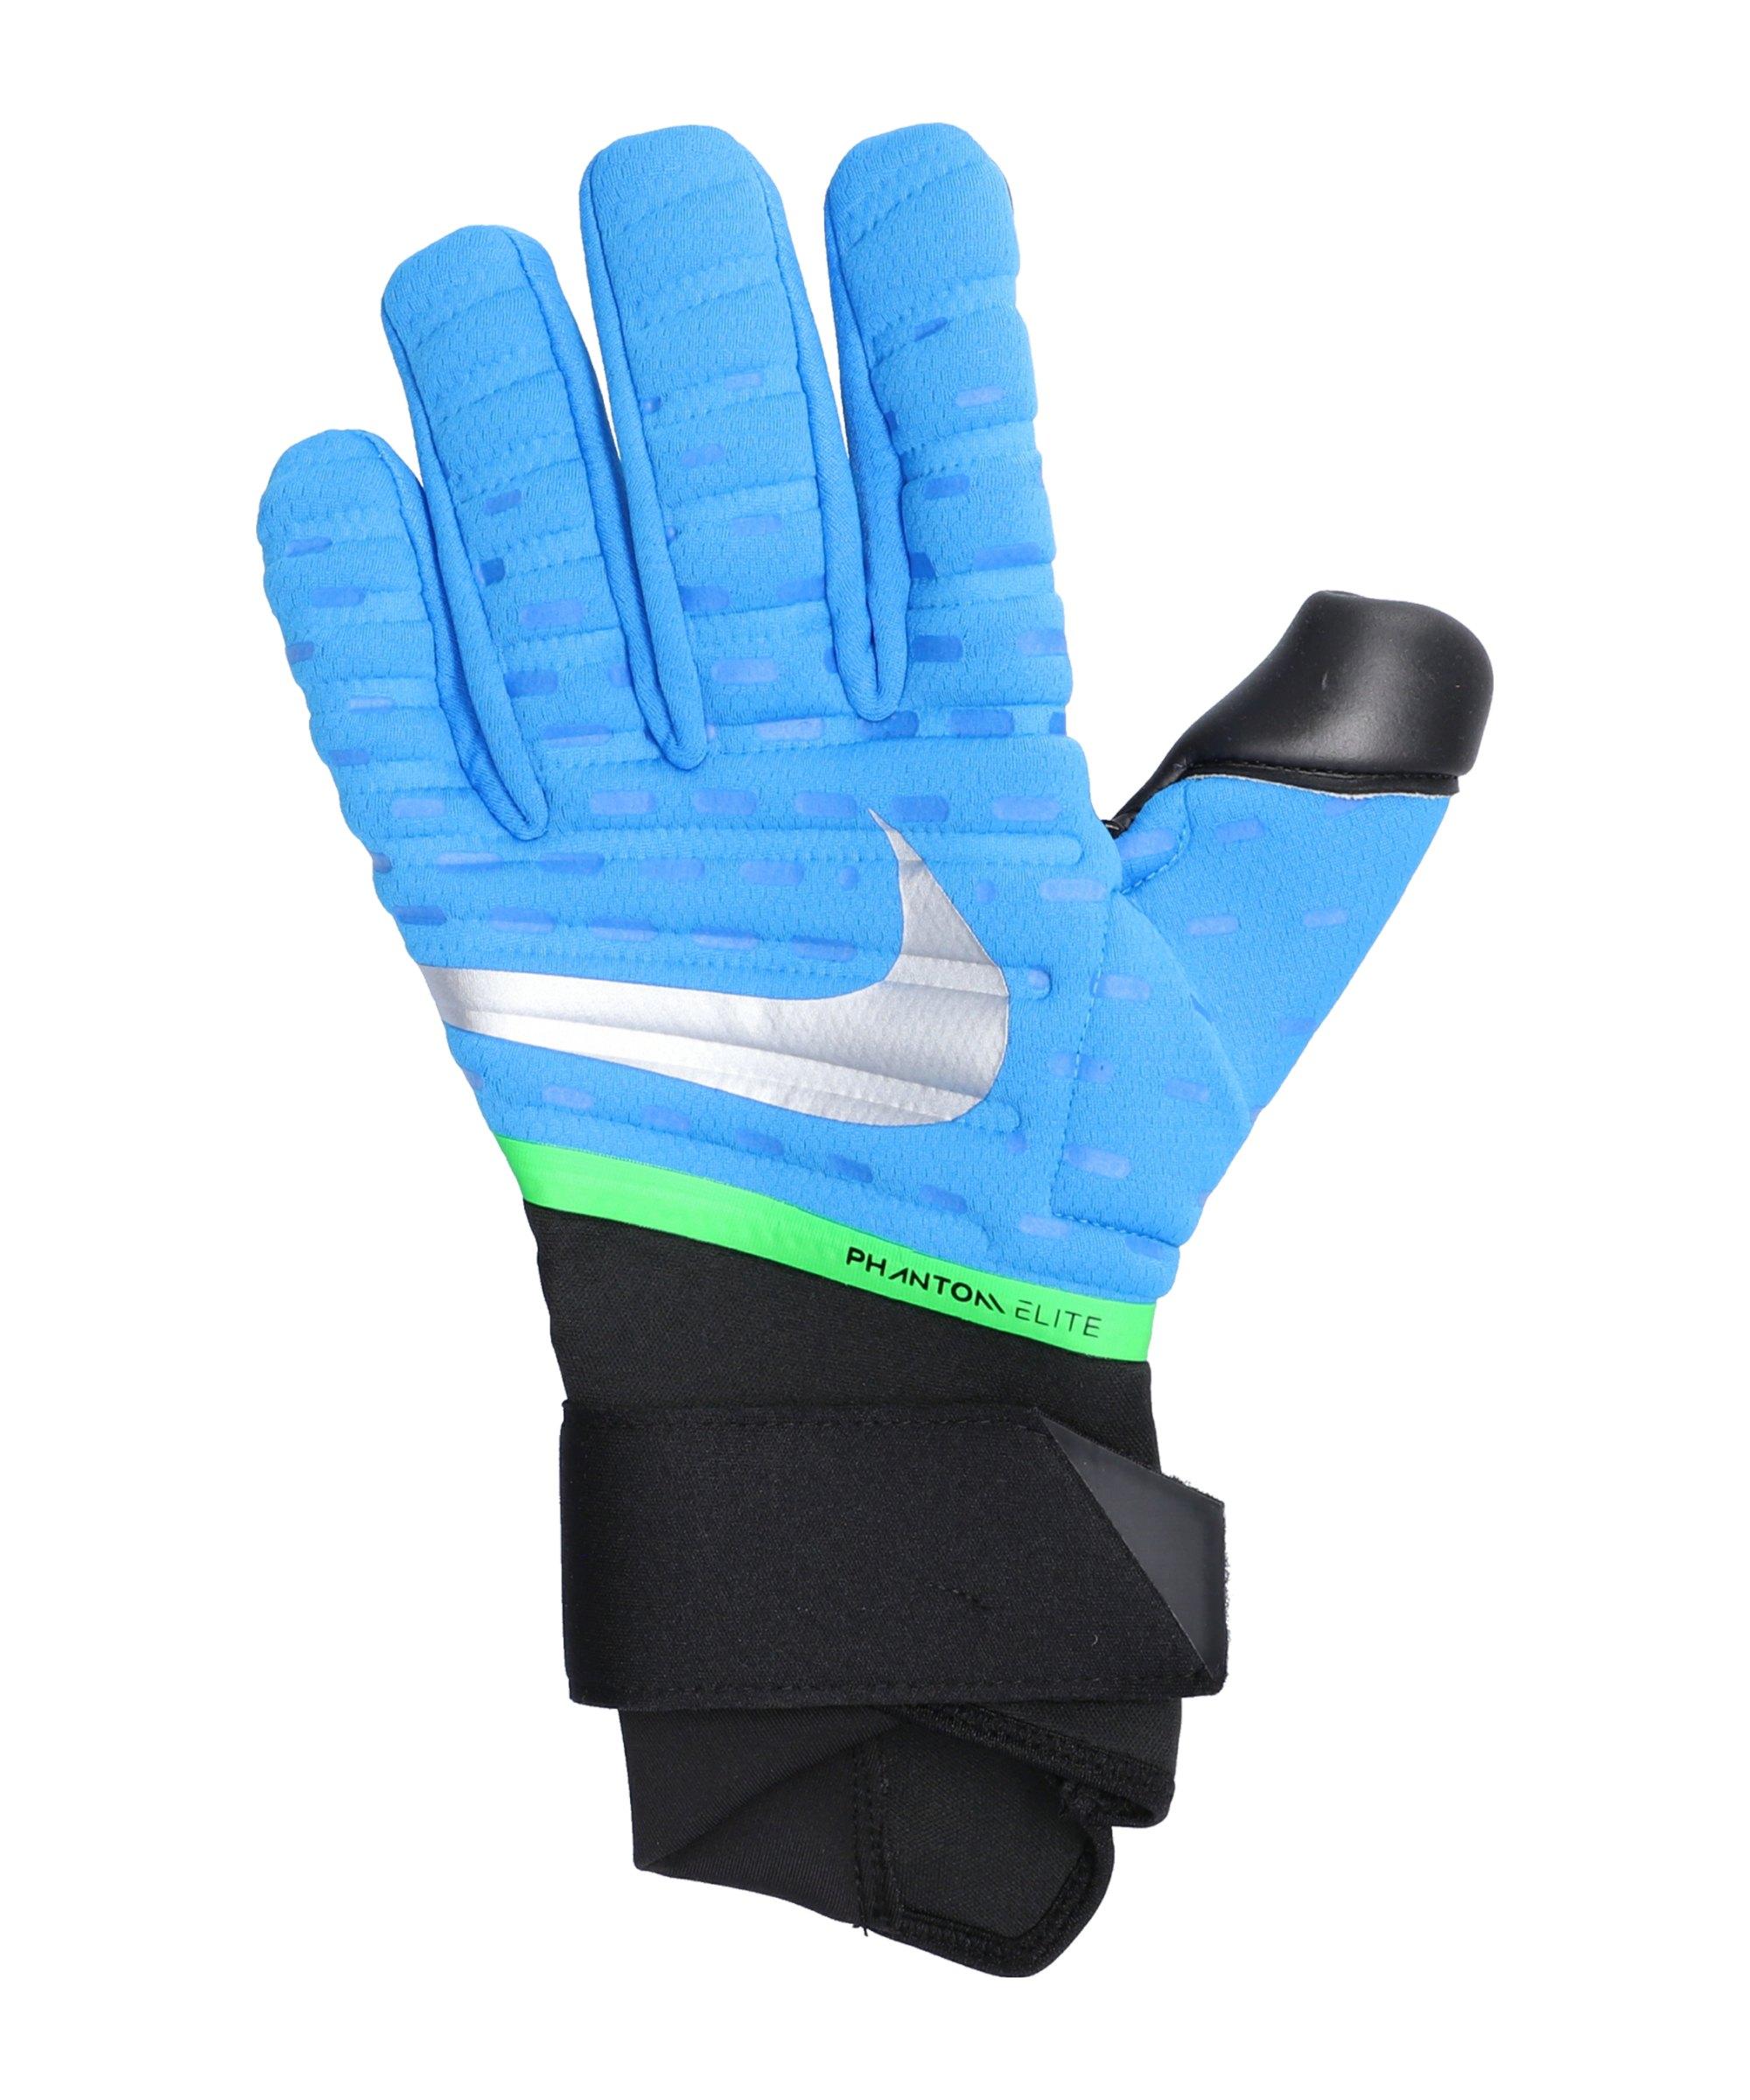 Nike Phantom Elite PROMO Torwarthandschuh F406 - blau